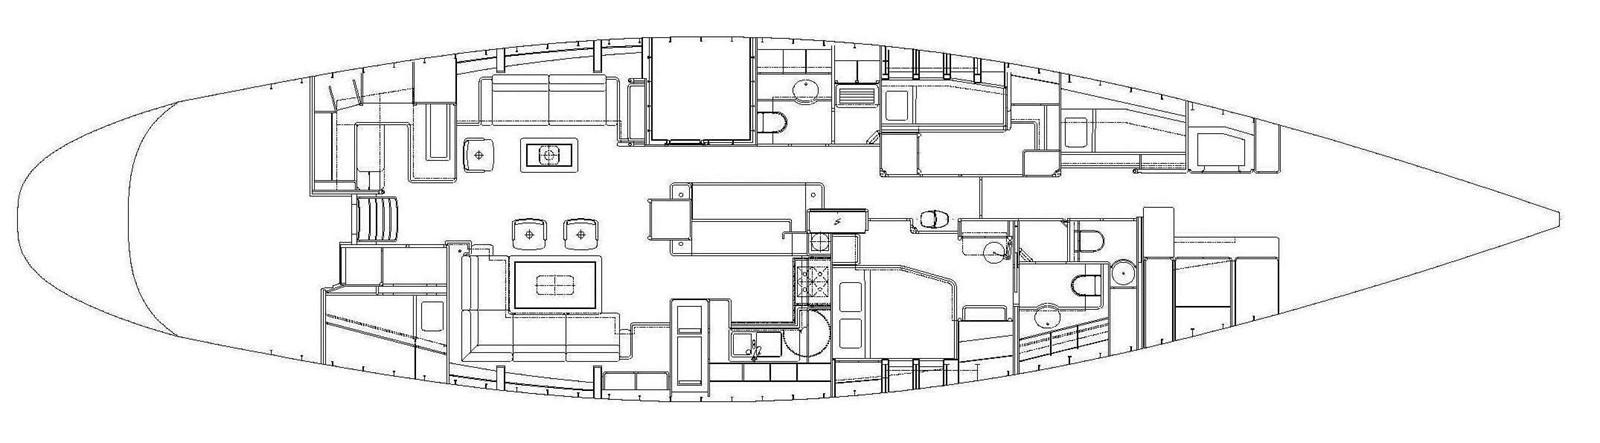 Plan of interior 1992 ROYAL HUISMAN 84' Cruising Sailboat 1255710